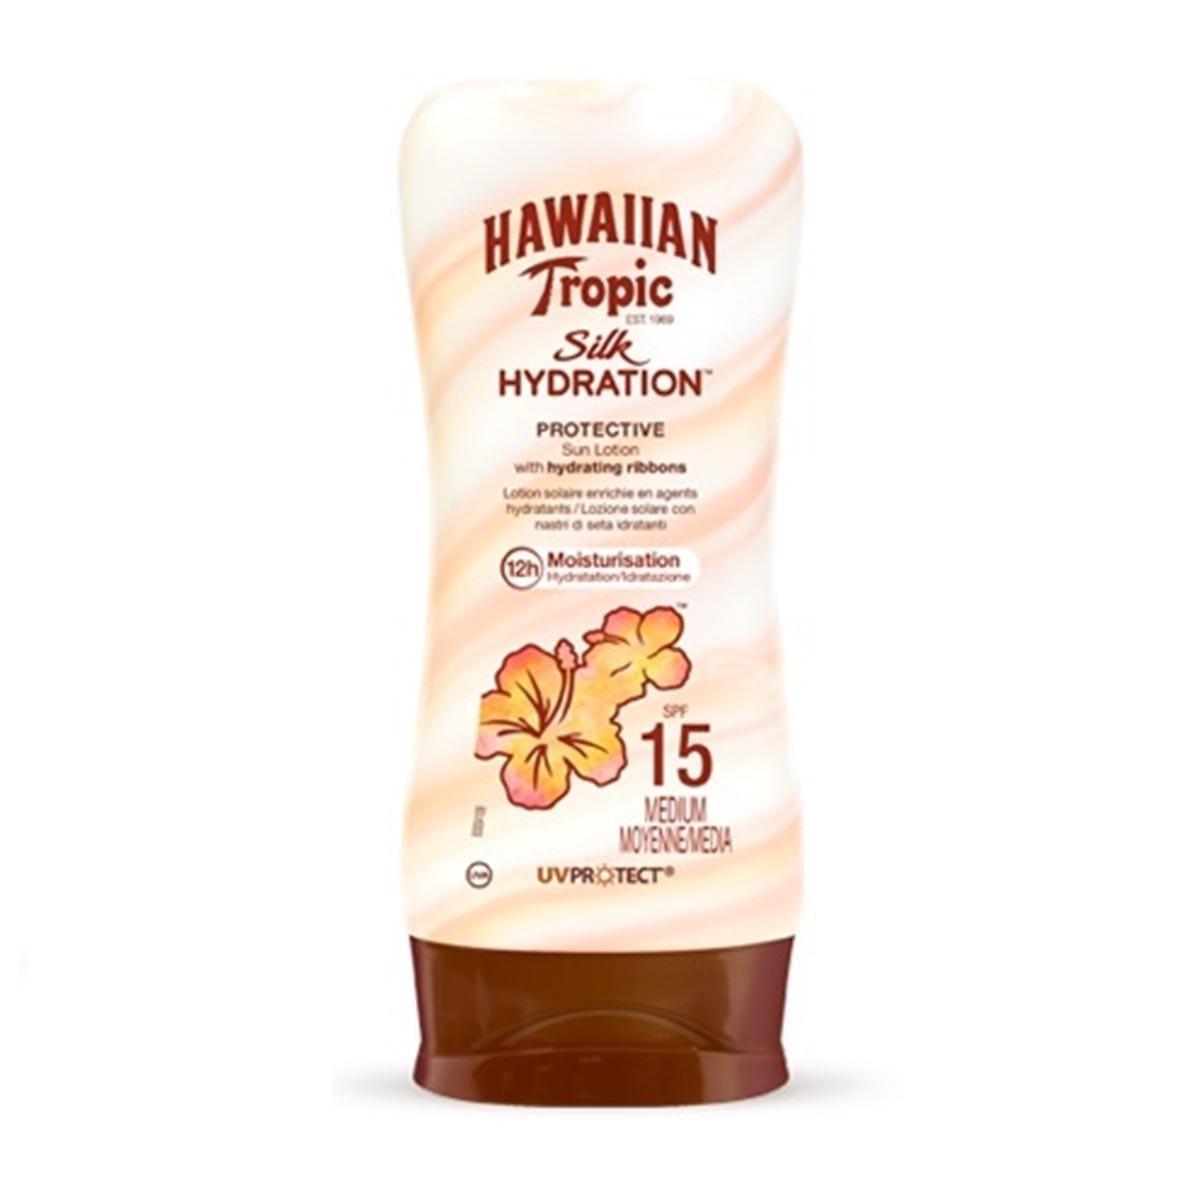 hawaian tropic